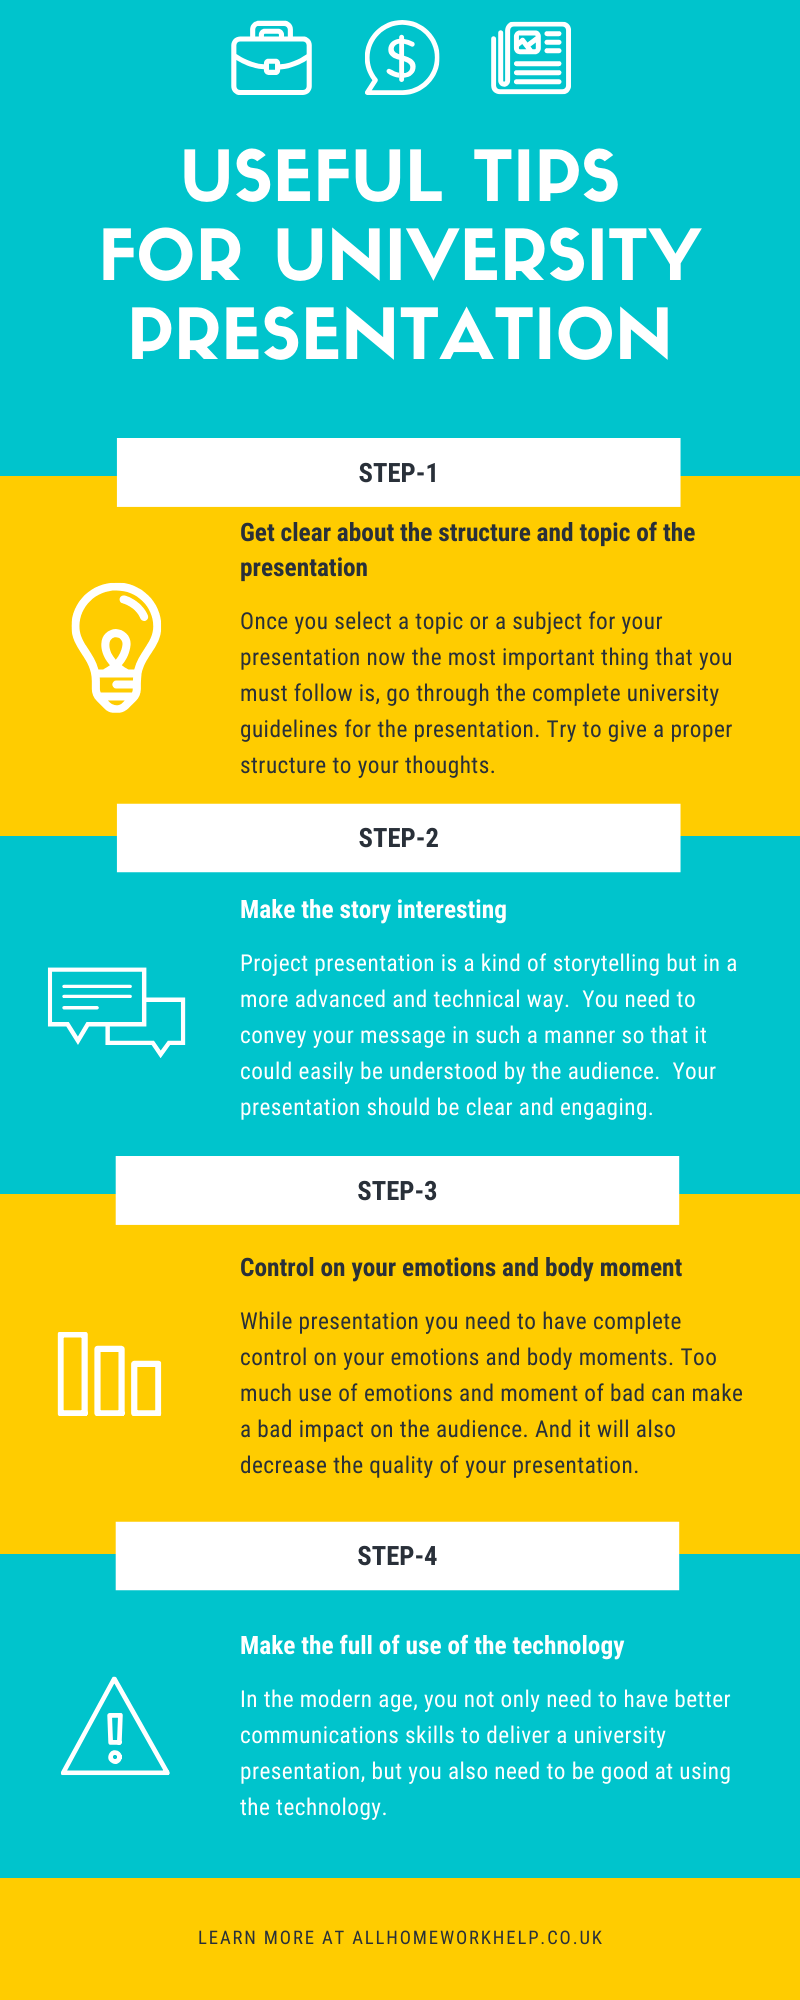 Some-Useful-Tips-For-University Presentation